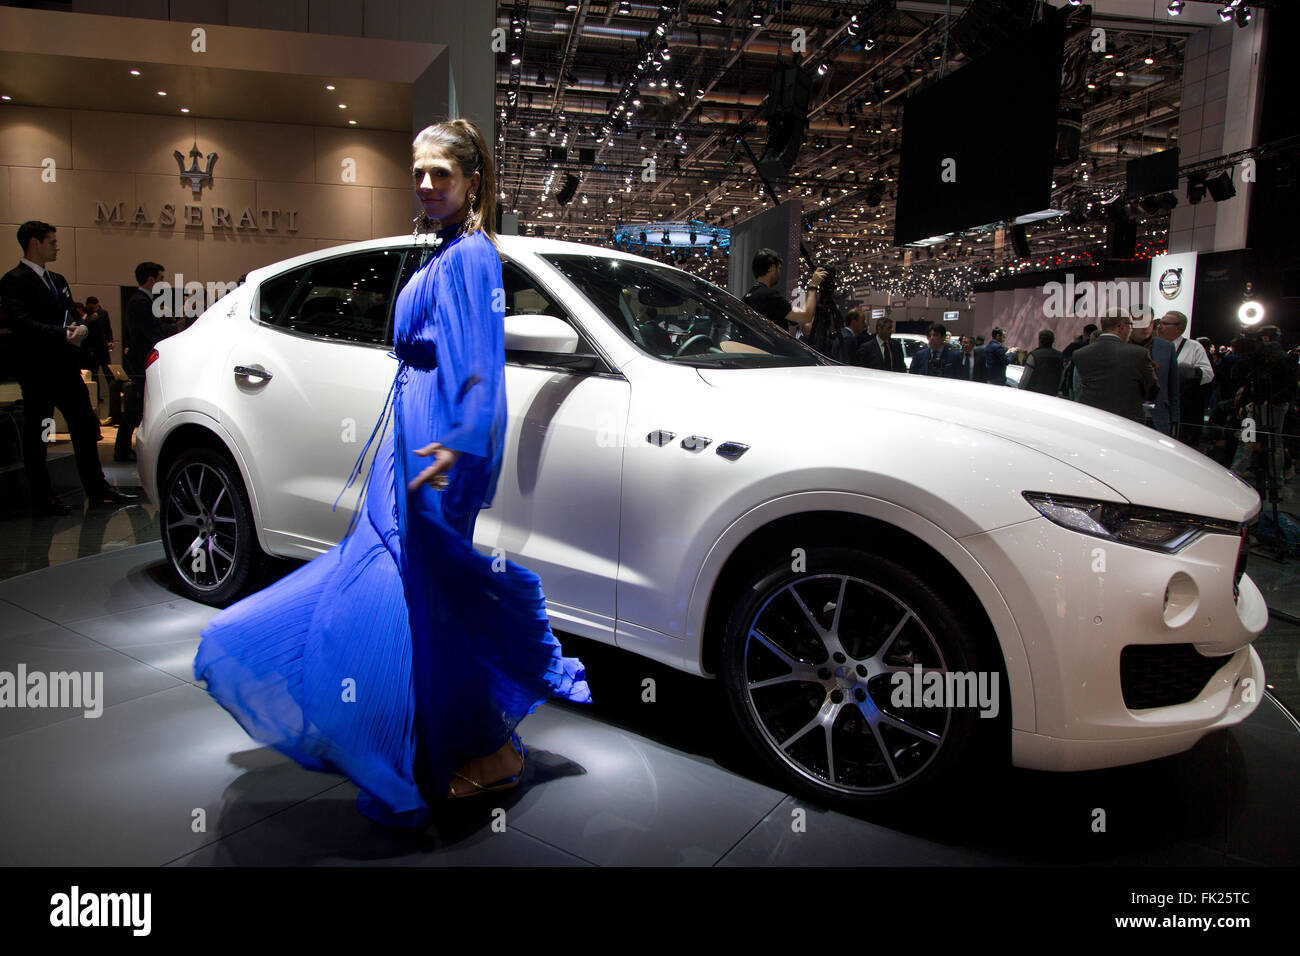 Maserati Levante SUV at the Geneva Motor Show 2016 - Stock Image